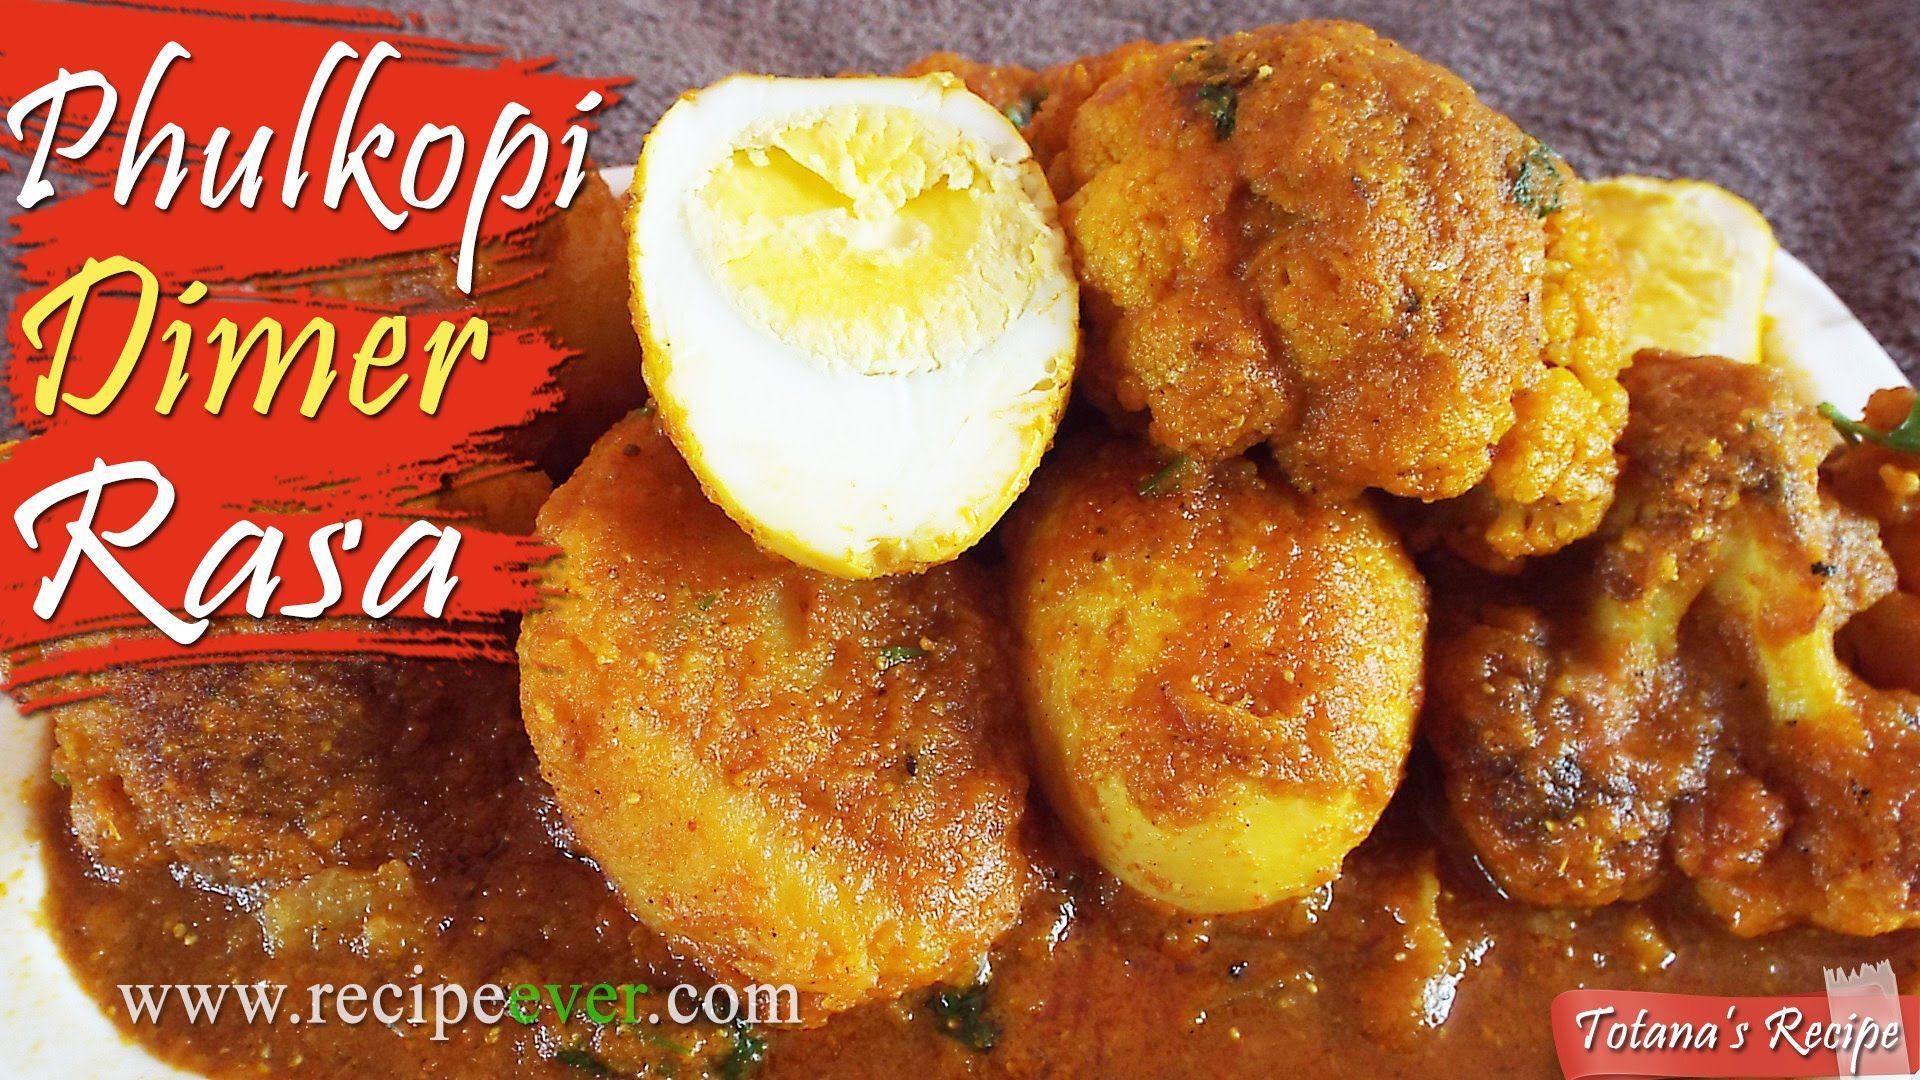 Phulkopi Dimer Rasa Cauliflower Curry Recipe Aloo Phulkopir Dalna Resep Makanan Resep Sederhana Makanan